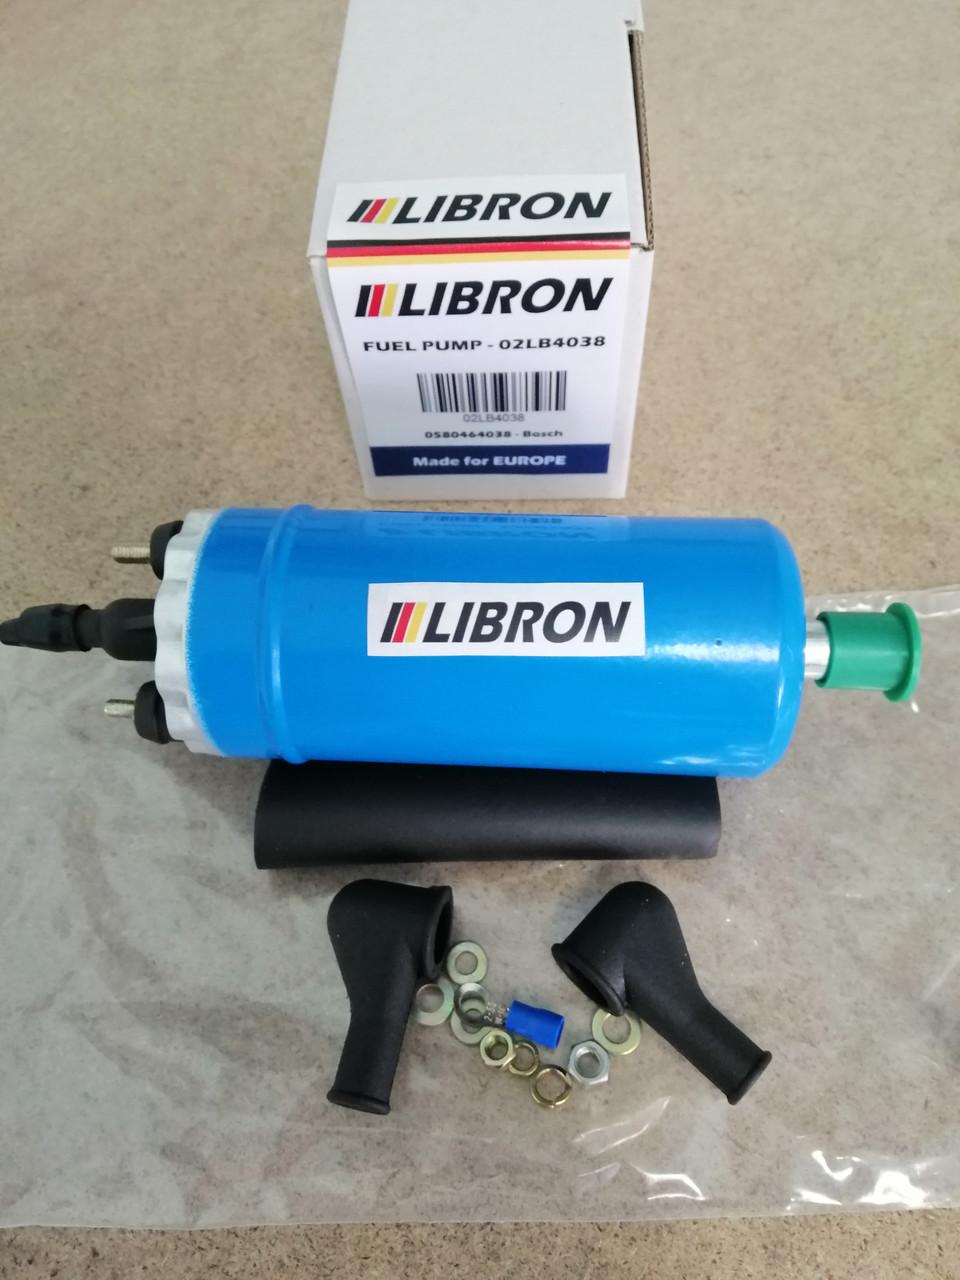 Топливный насос LIBRON 02LB4038 - OPEL ASCONA B (81_, 86_, 87_, 88_) 2.0 E (1979-1981)